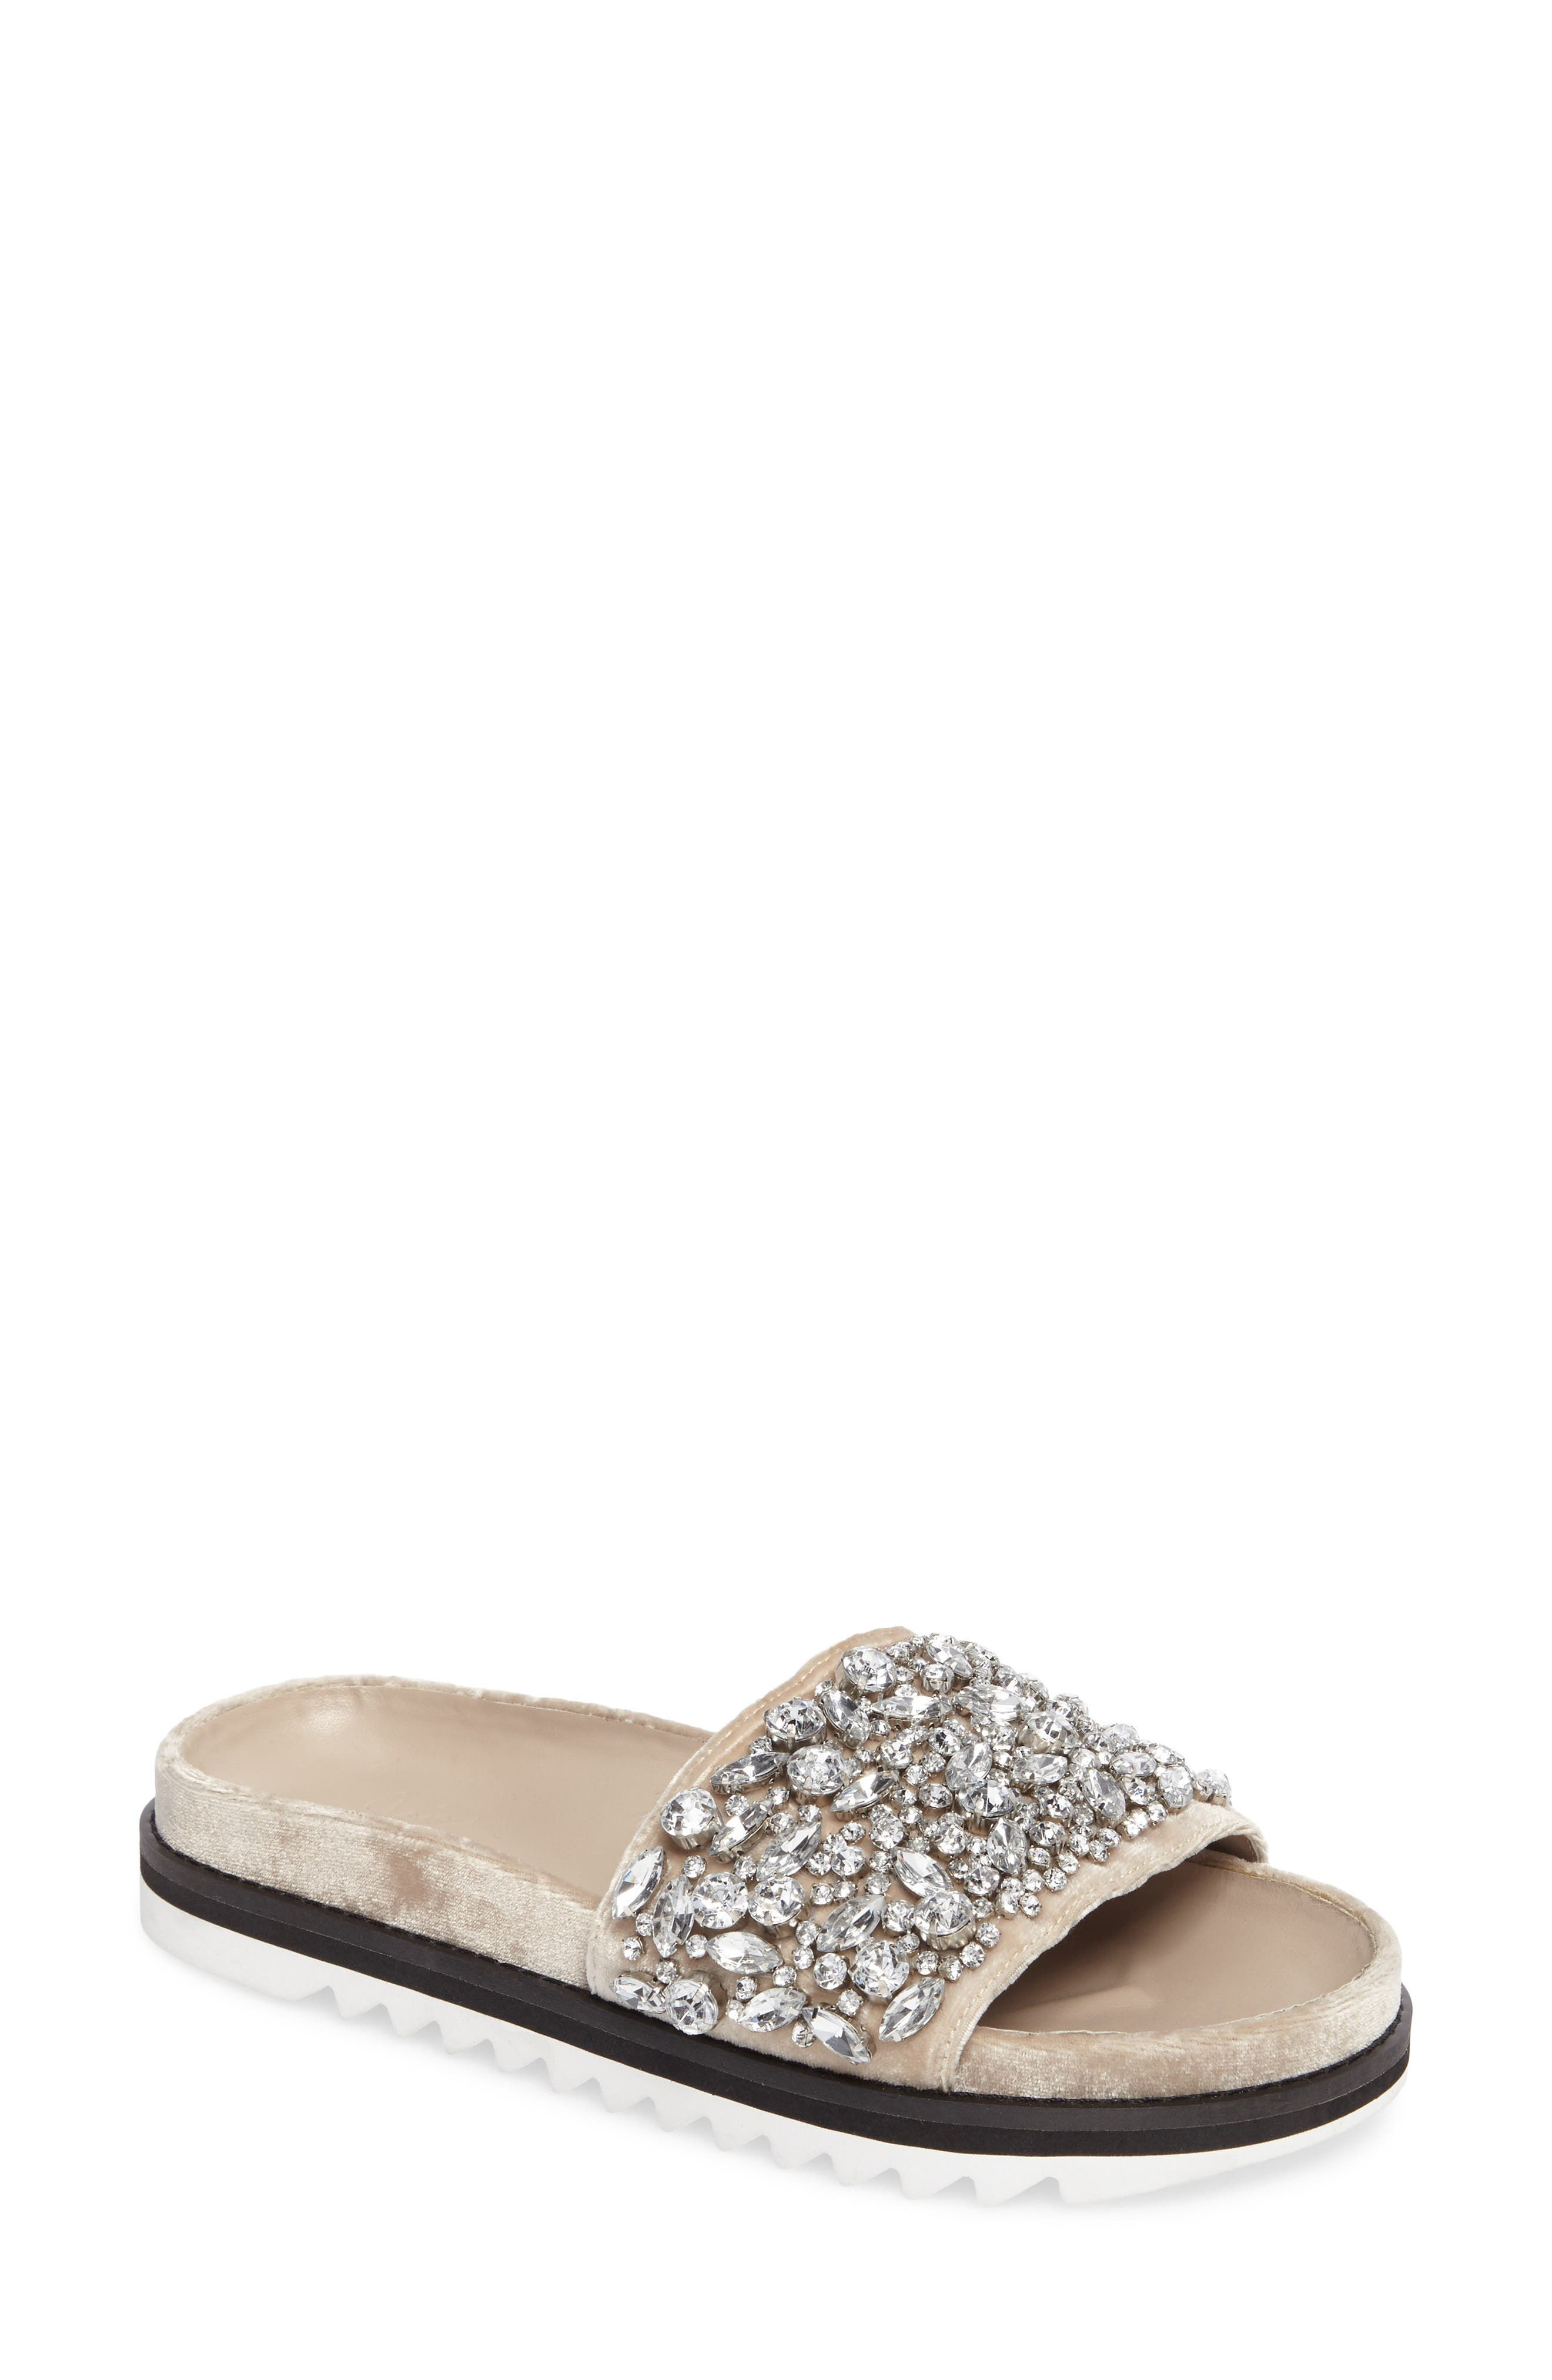 Jacory Crystal Embellished Slide Sandal,                             Main thumbnail 1, color,